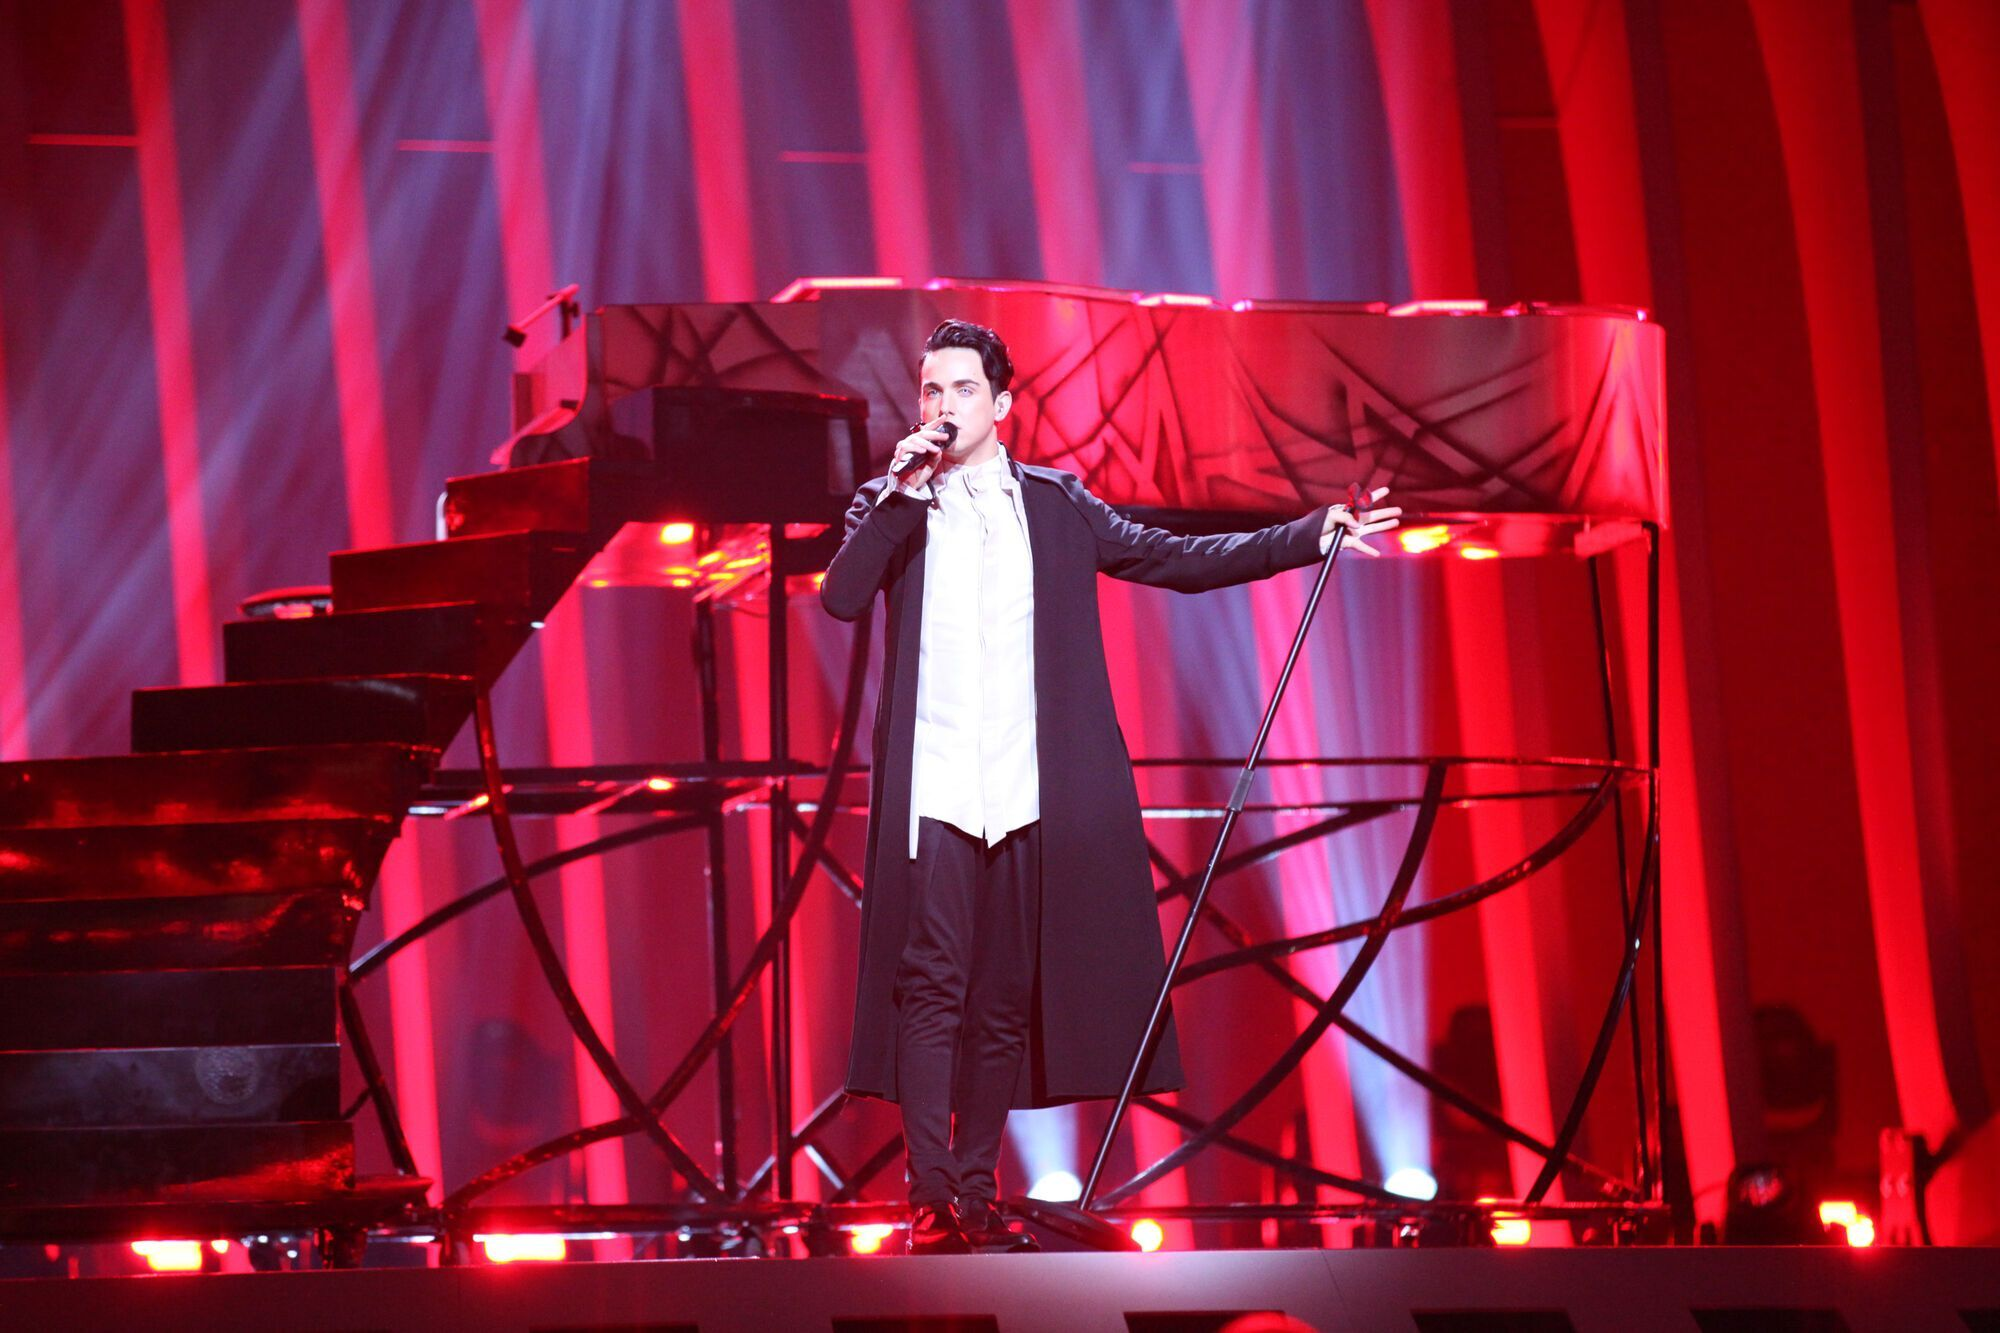 Melovin представлял Украину на Евровидении в 2018 году